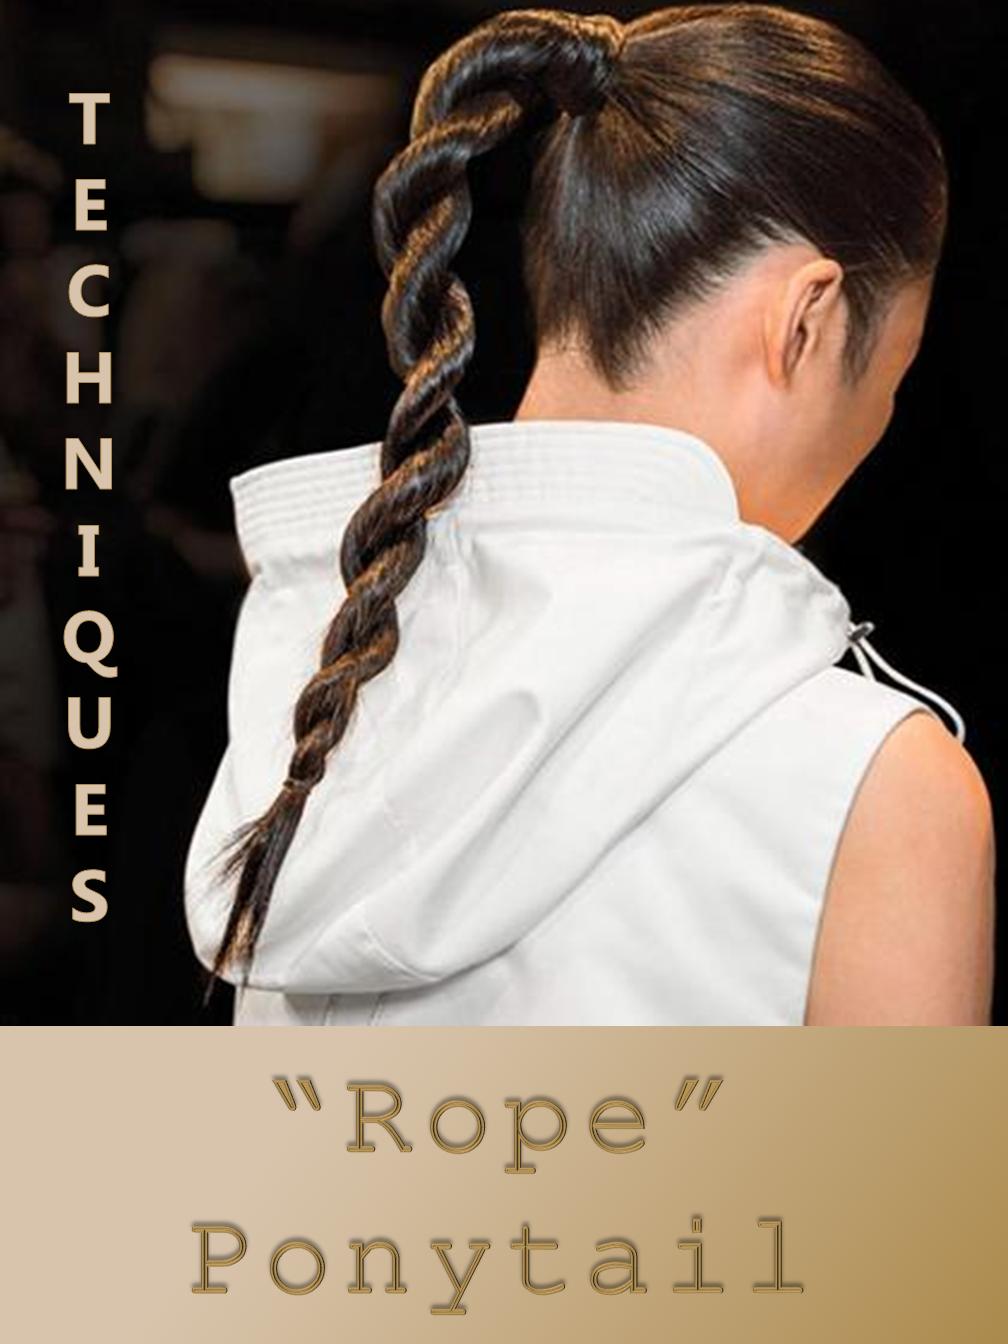 """Rope"" Ponytails"